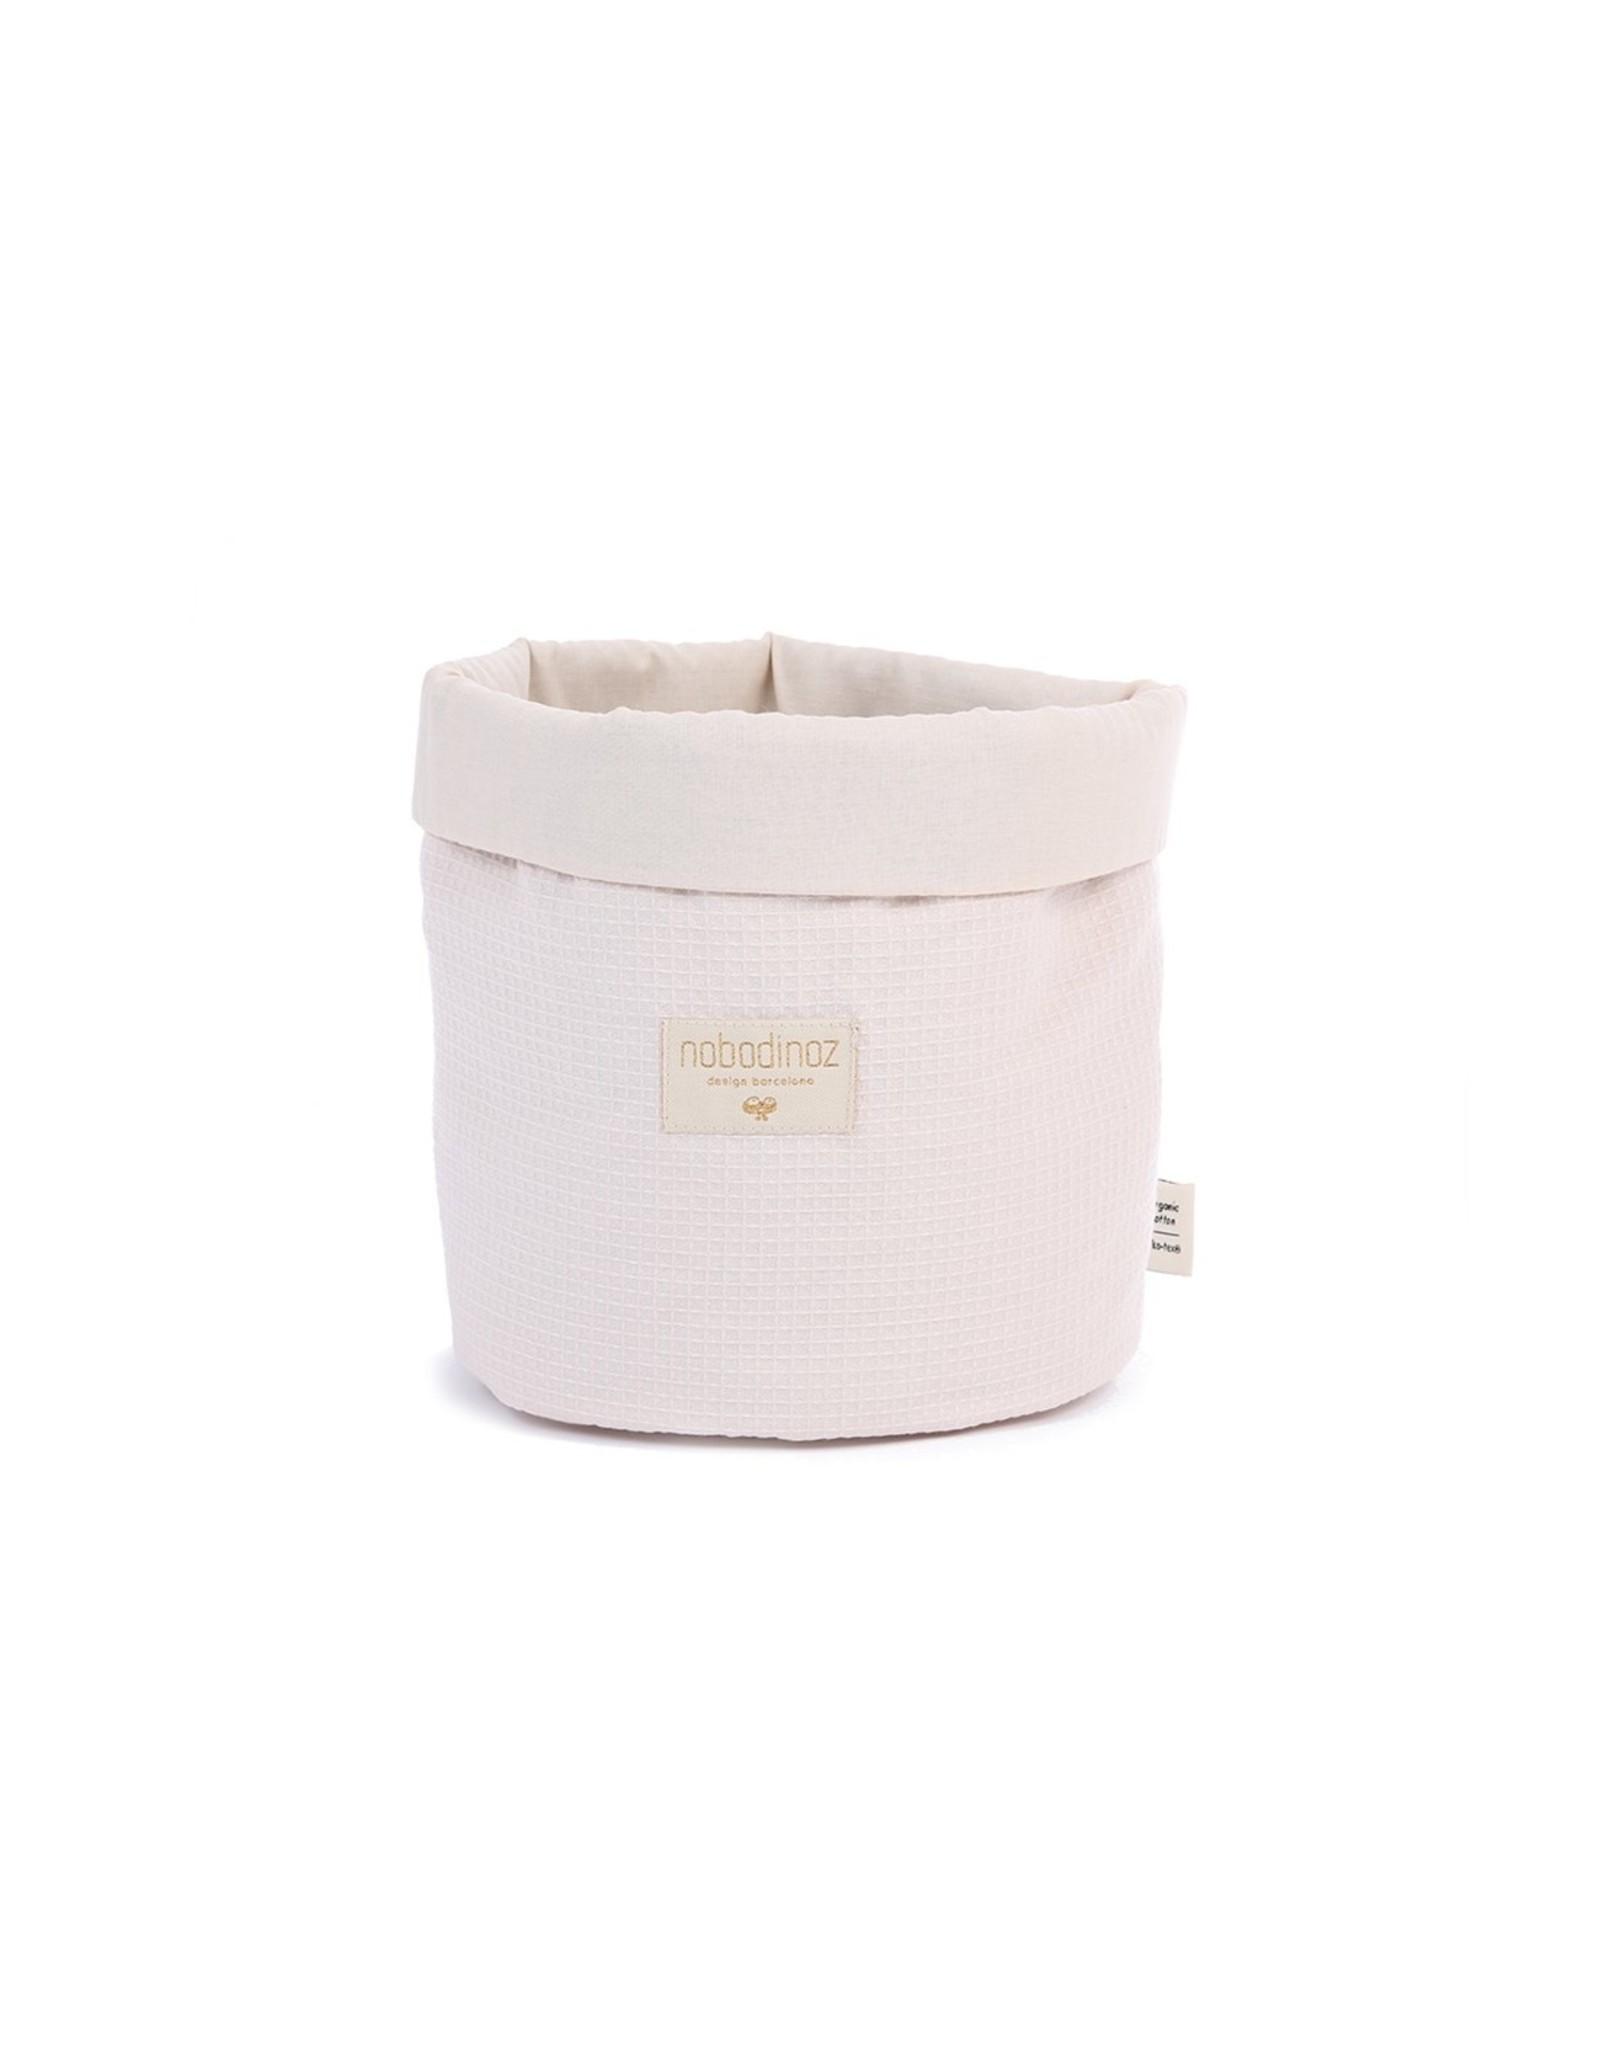 nobodinoz Panier de rangement PANDA - S - Nid d'abeille Dream pink